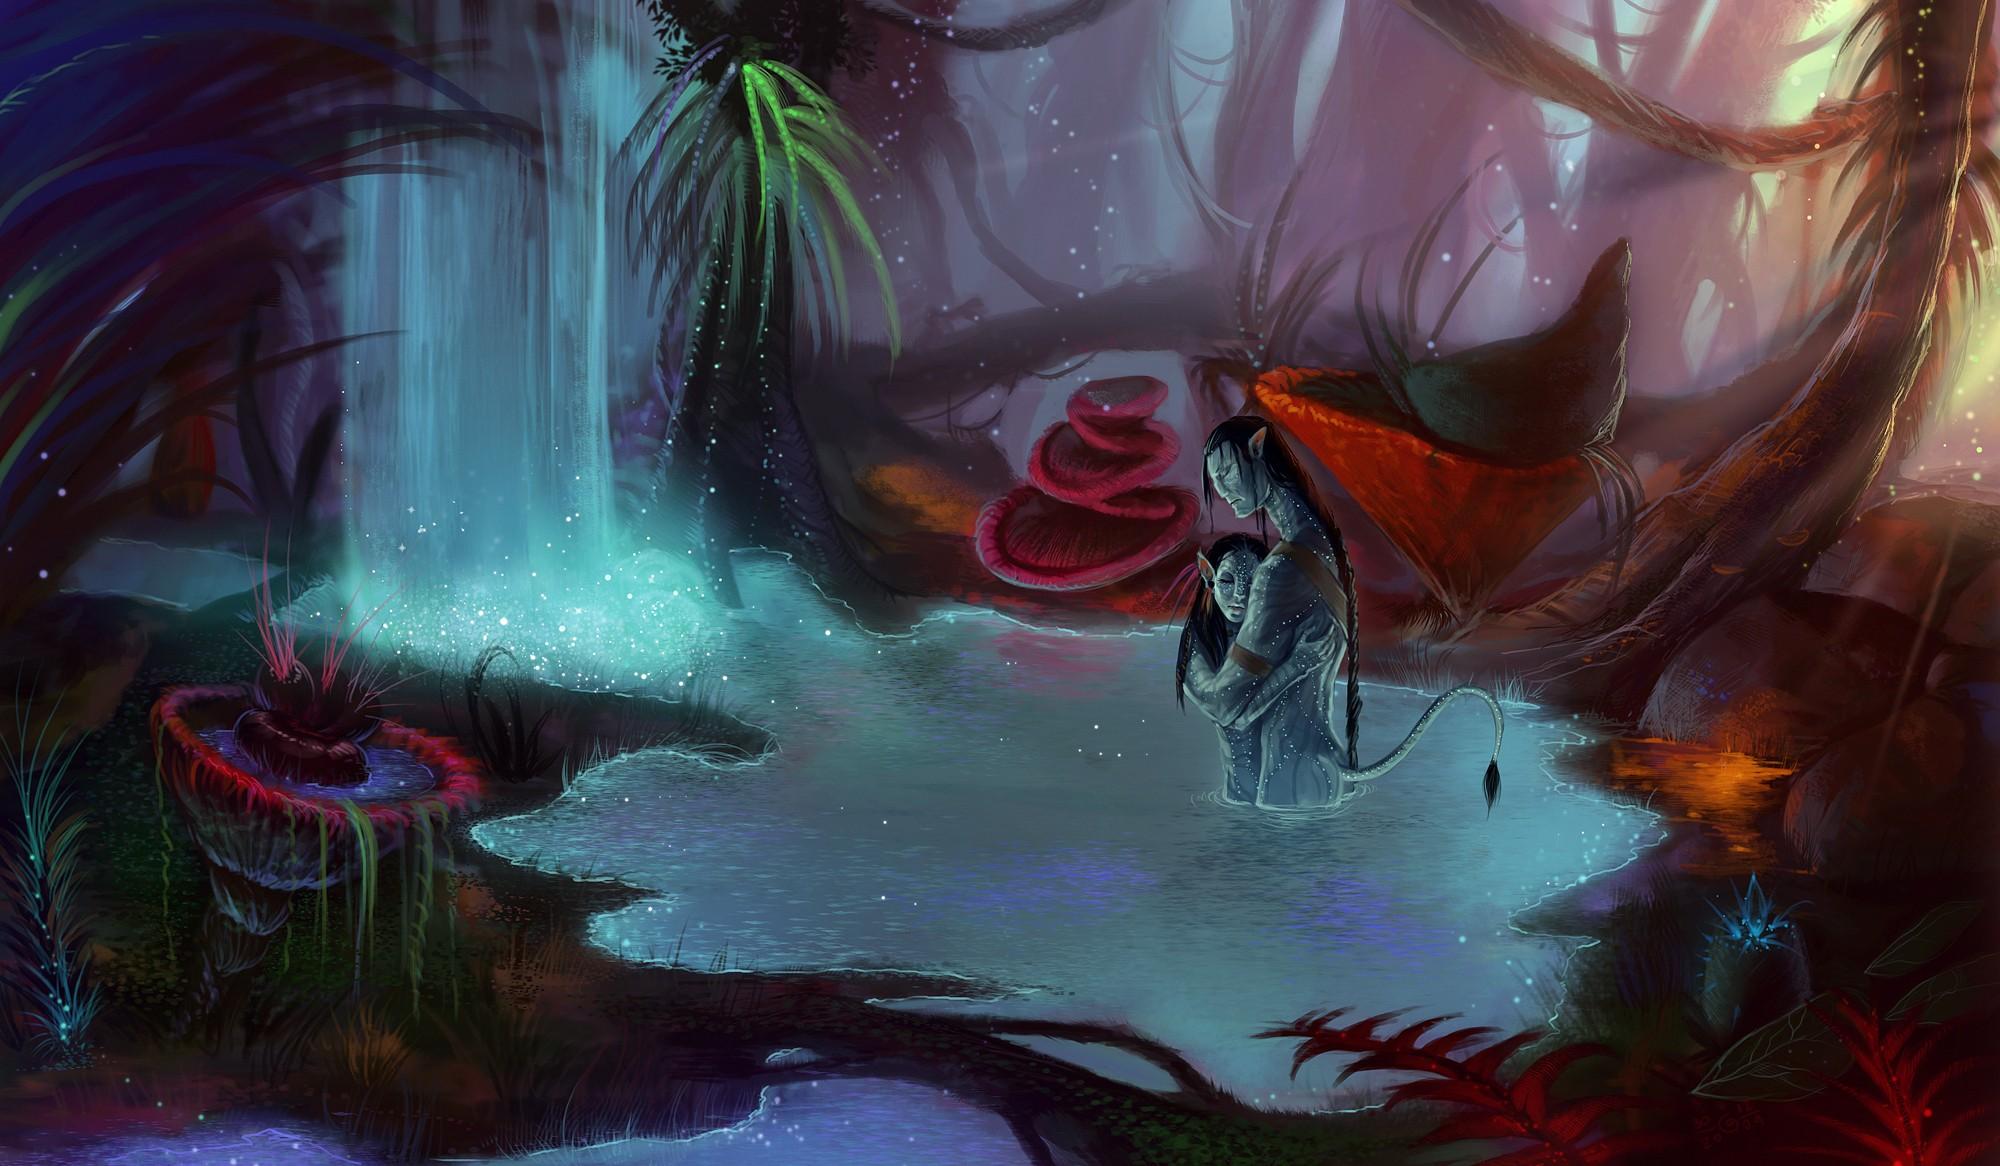 Fondos De Pantalla Dibujo Pintura Anime Avatar Pandora